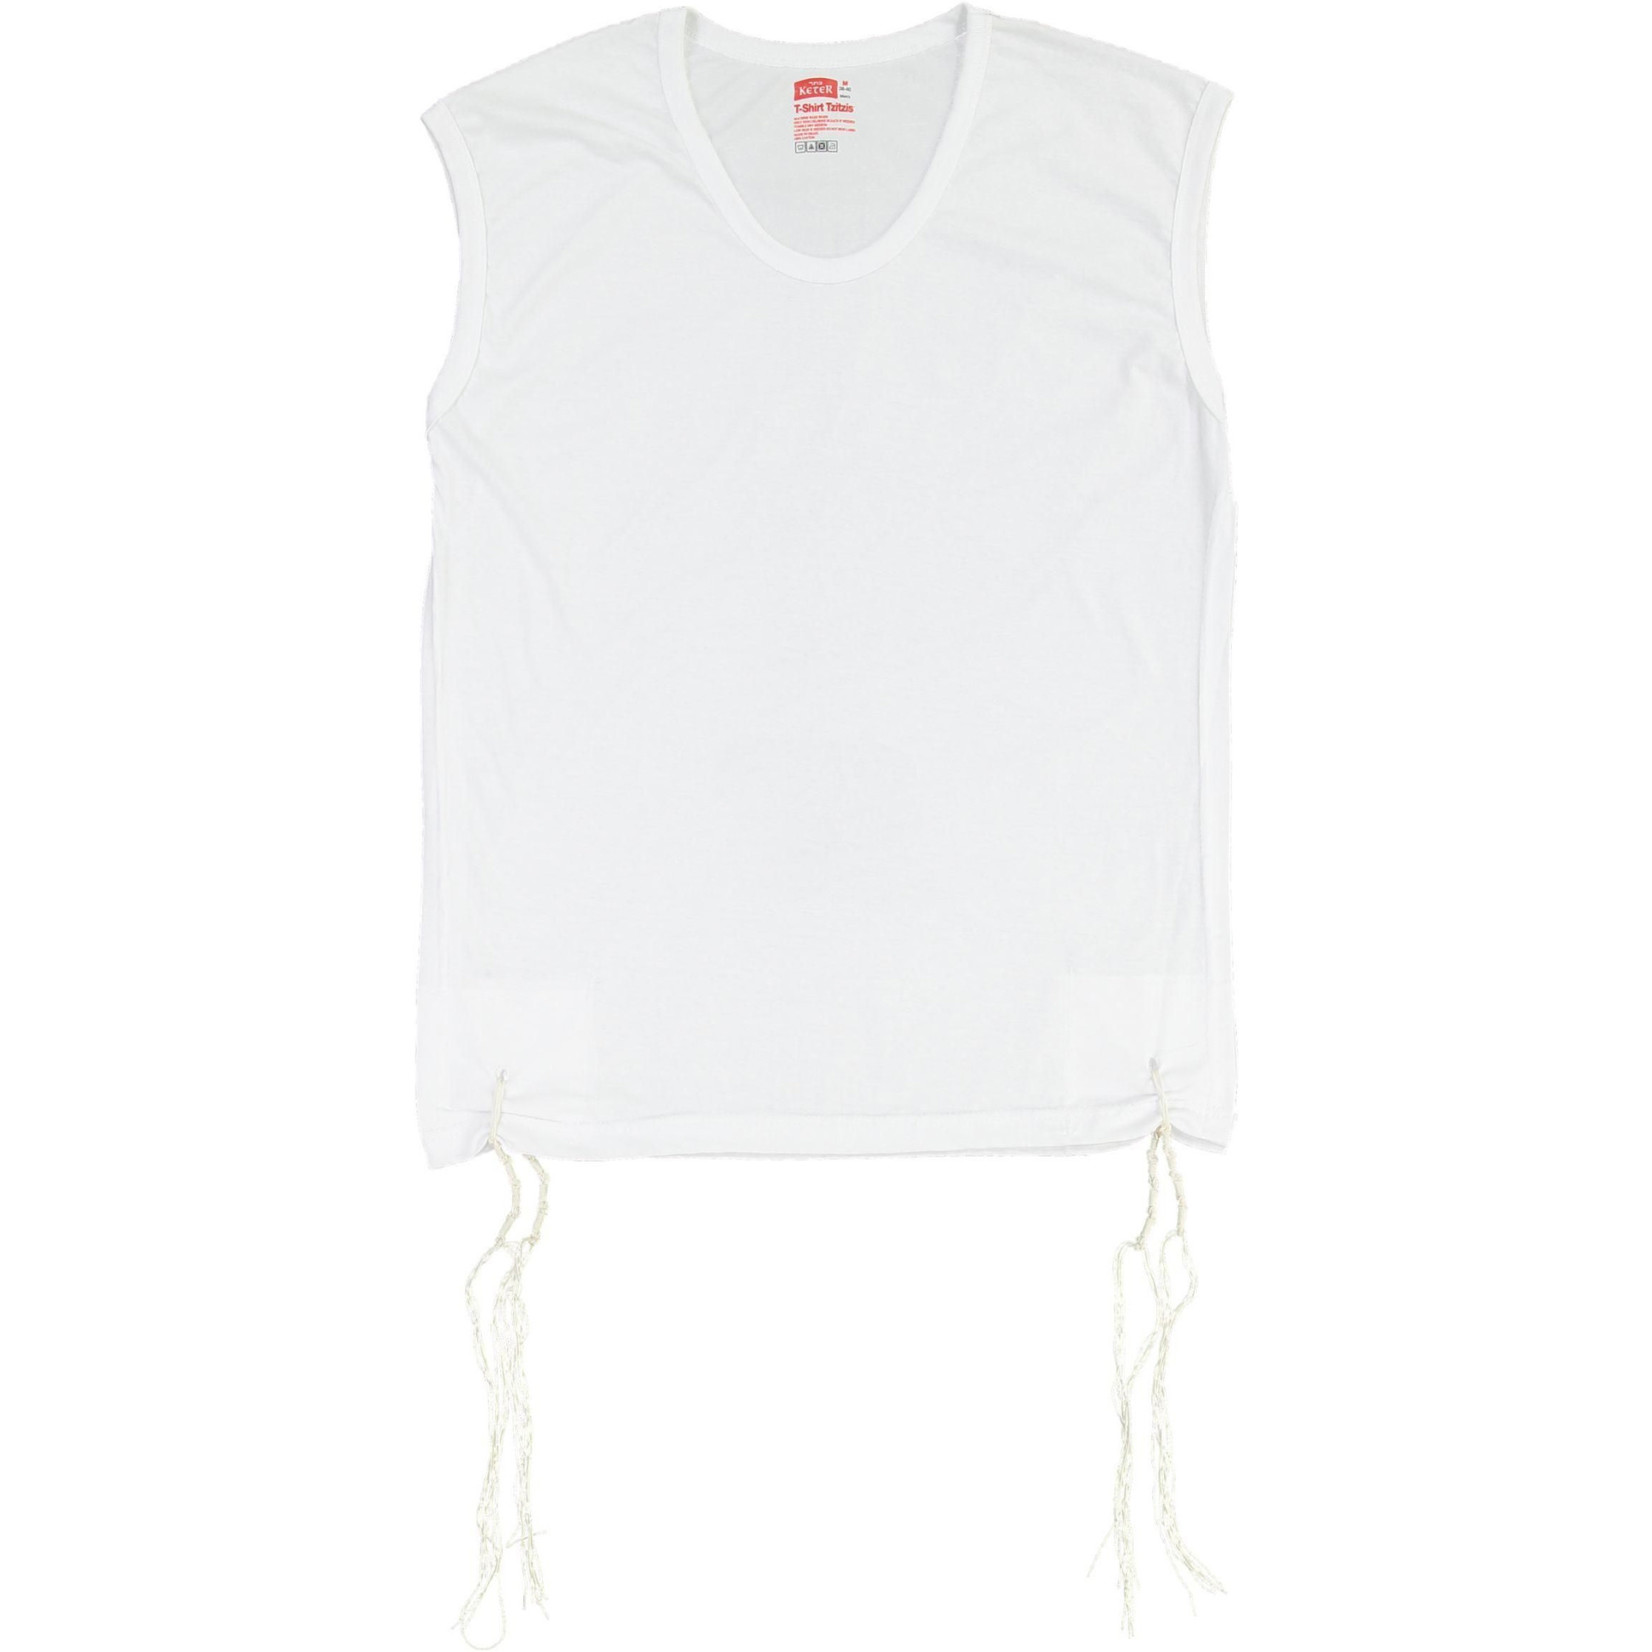 Undershirt-Style Arbah Kanfot, 100% Cotton, Round Neck, Size XL